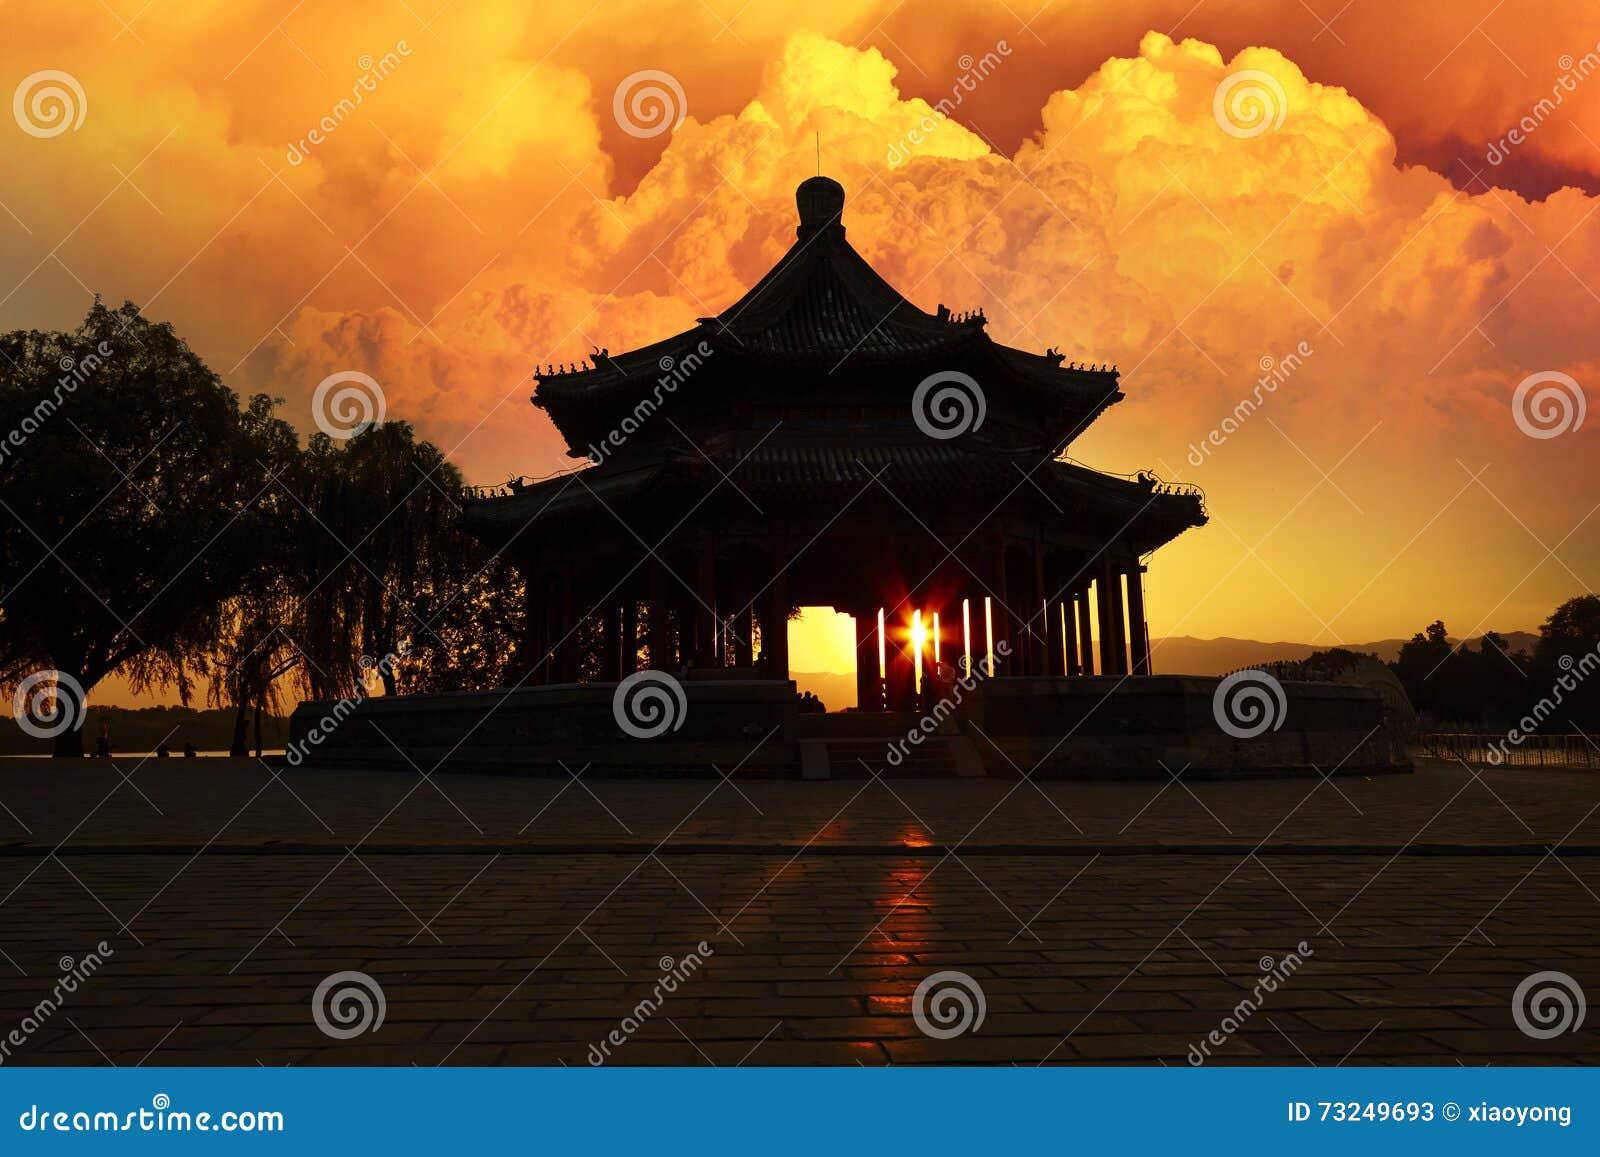 Magical sunset, the Summer Palace, Beijing, China